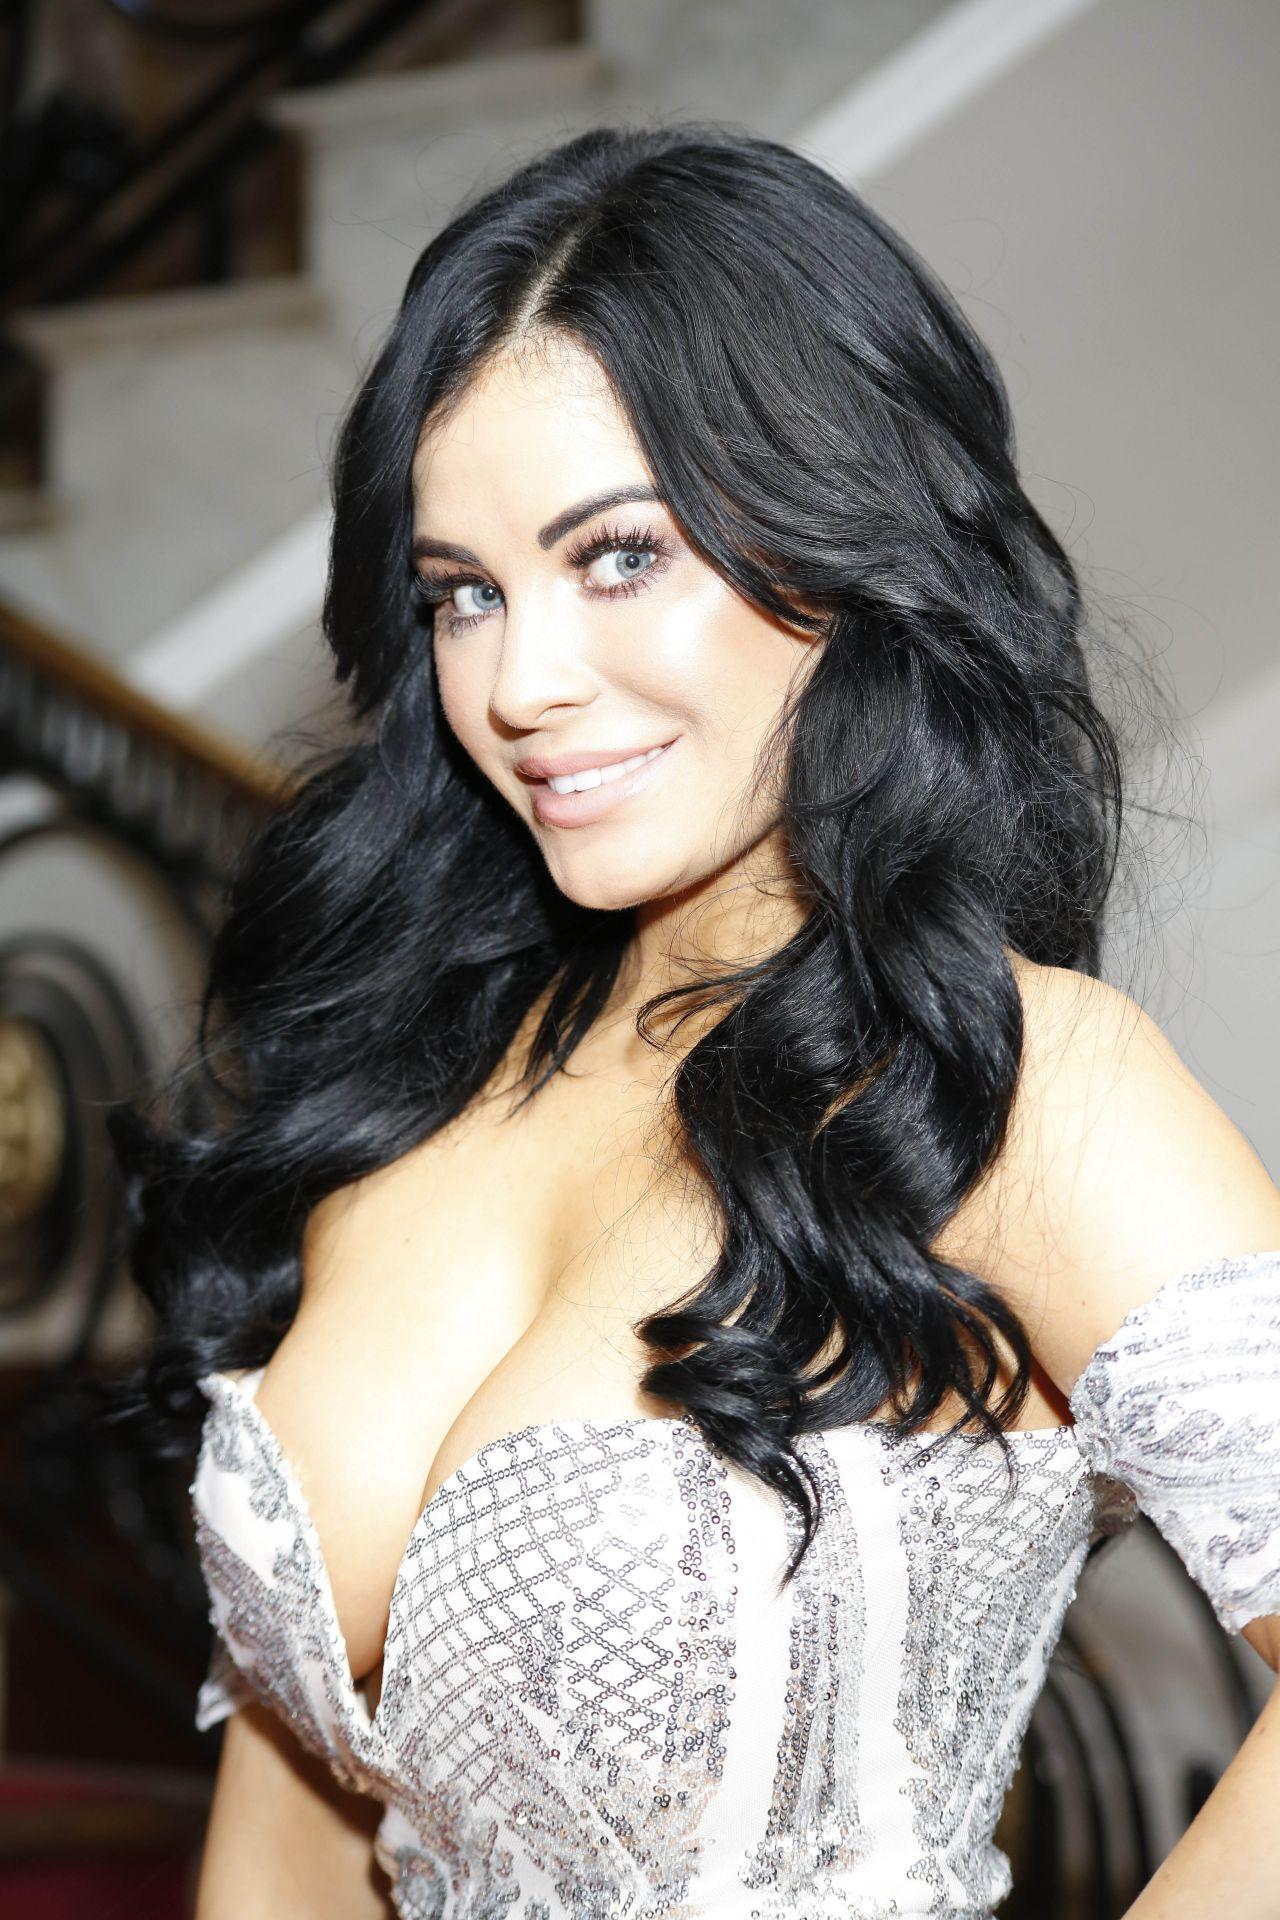 Allie (TNA Leaked Nude Photos 69